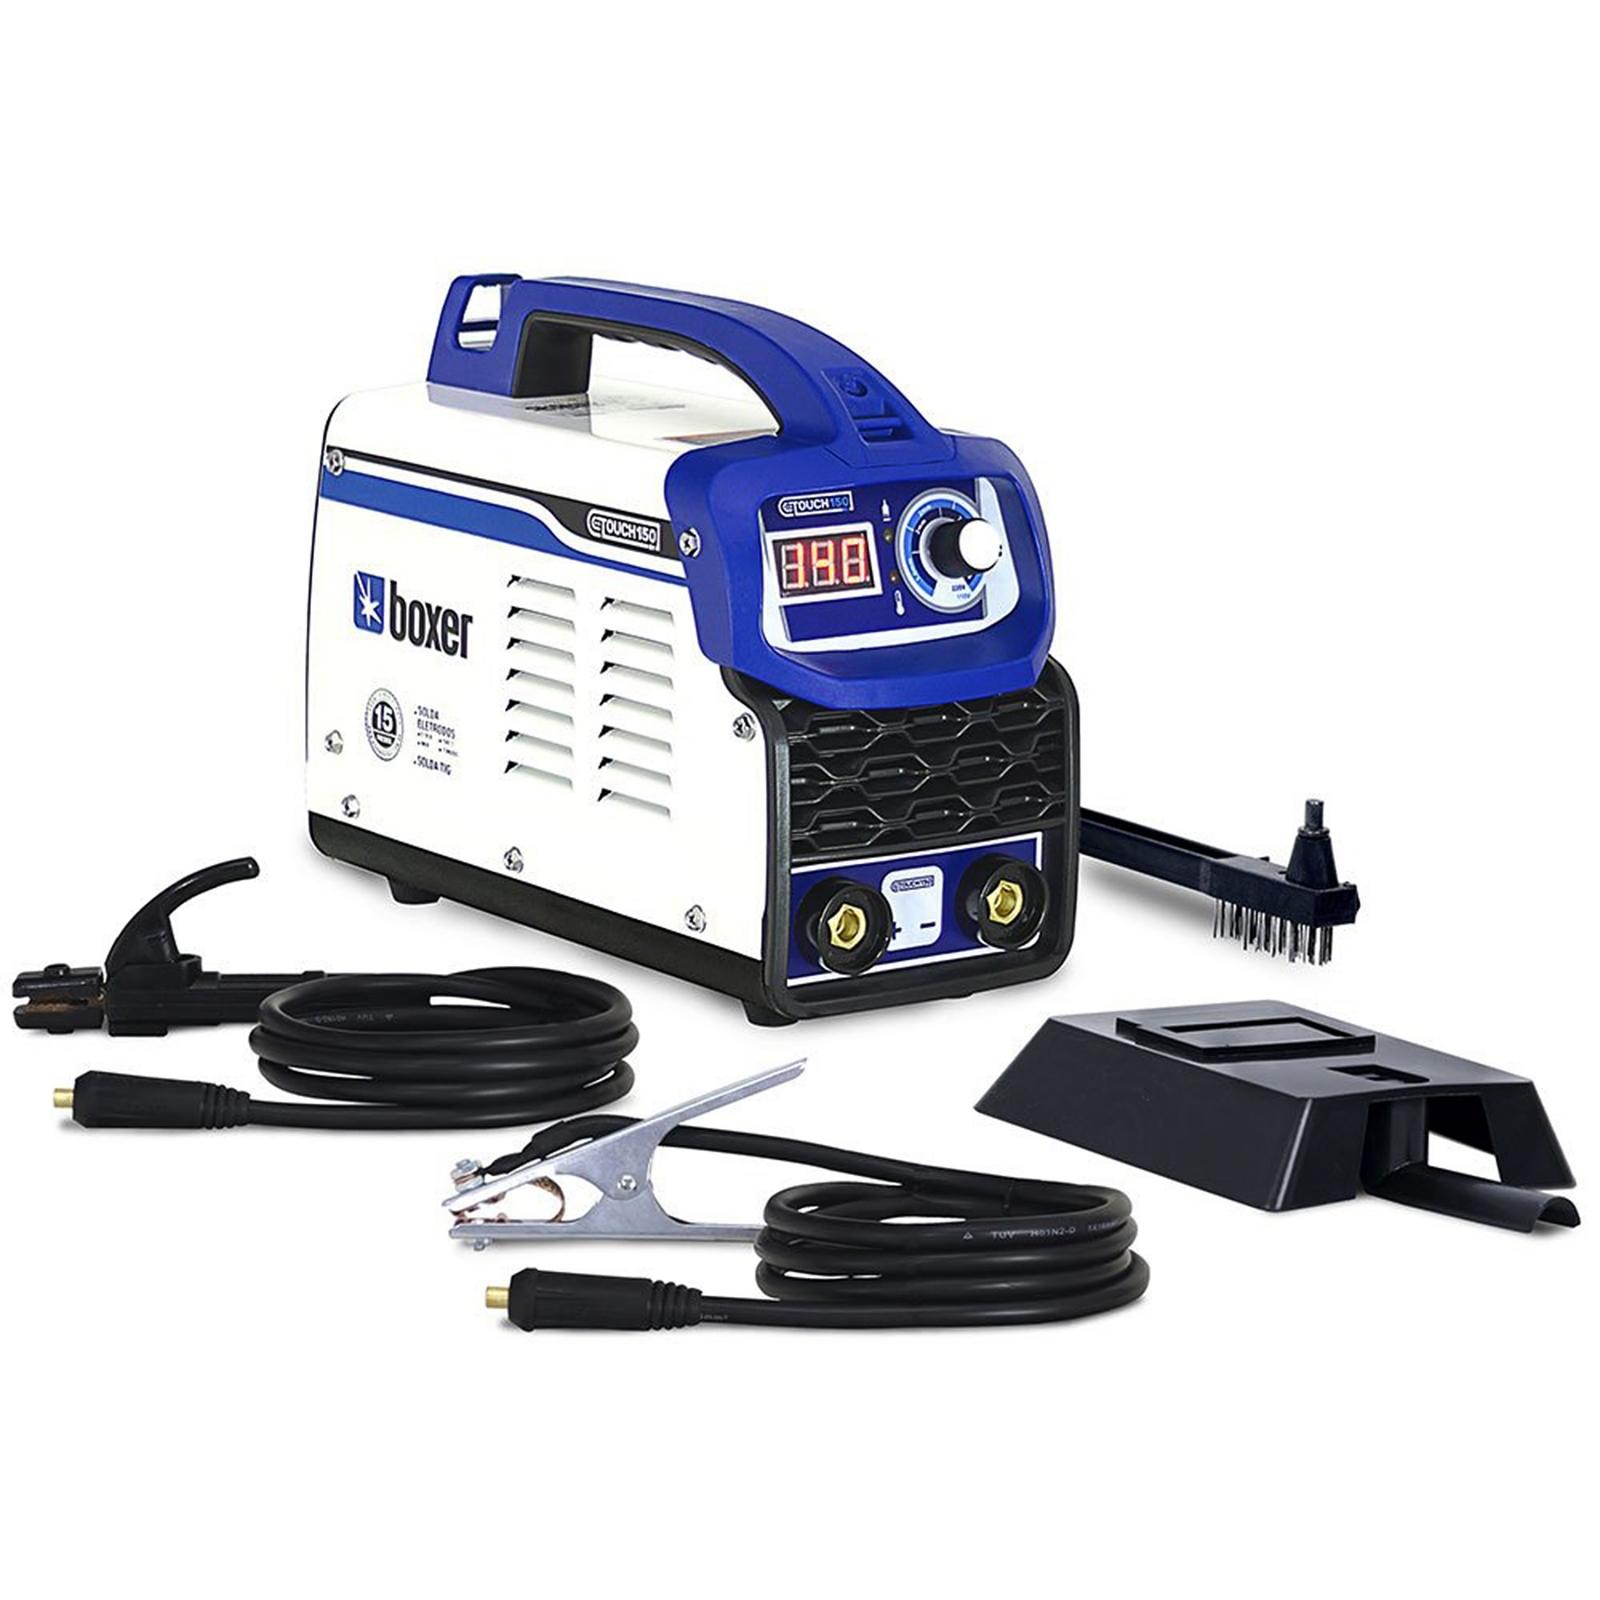 Máquina De Solda Eletrodo Boxer Touch 150 Bivolt - Ferramentas MEP